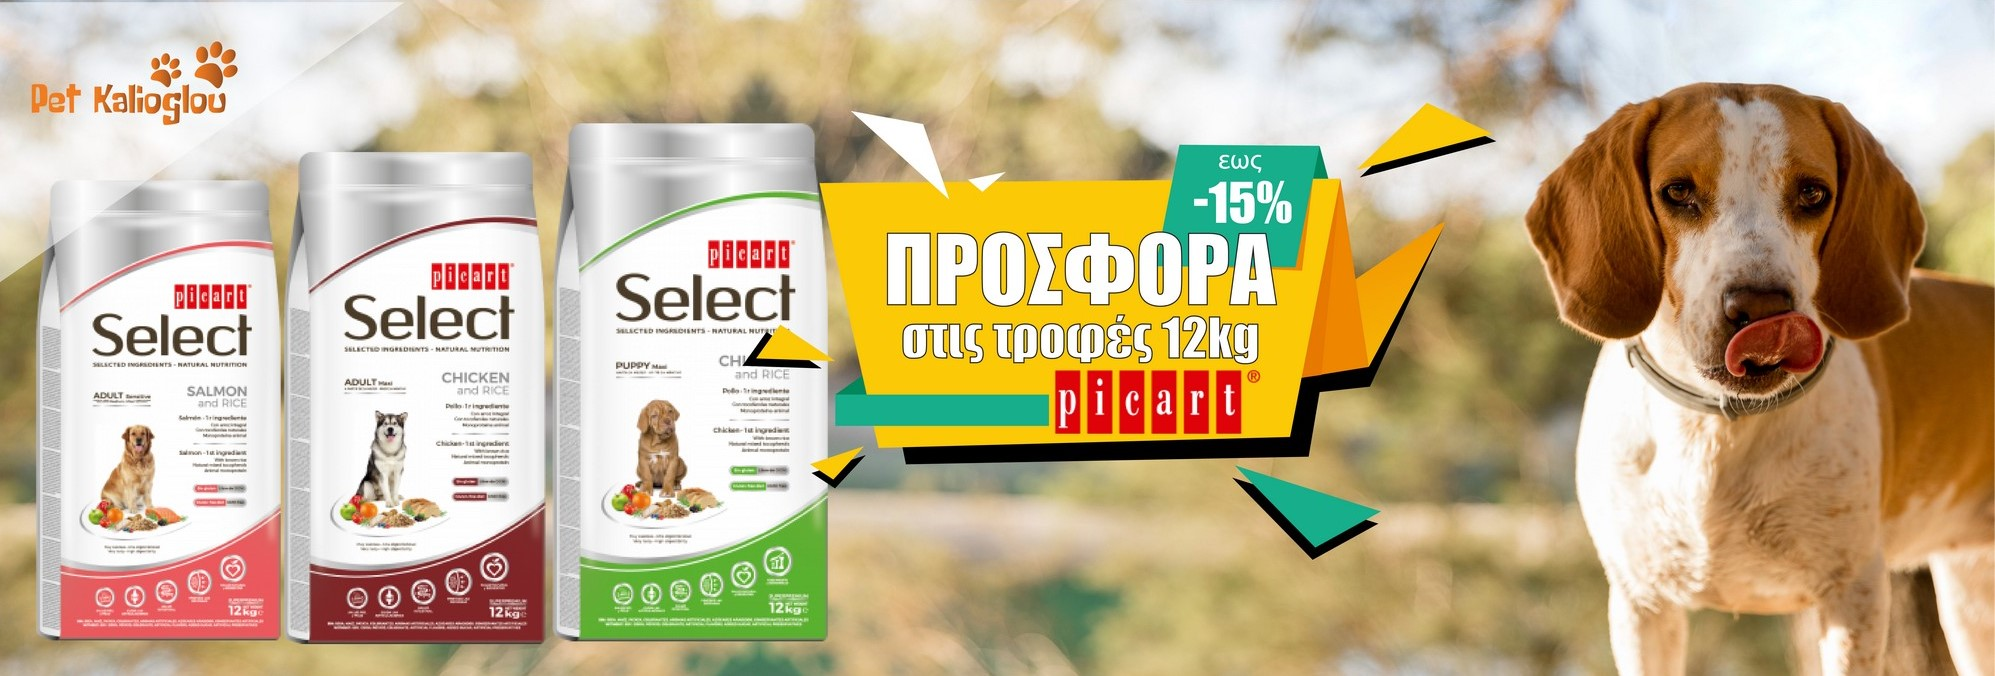 Pet Kalioglou - Online pet shop - Τροφές σκύλος - τροφές γάτα